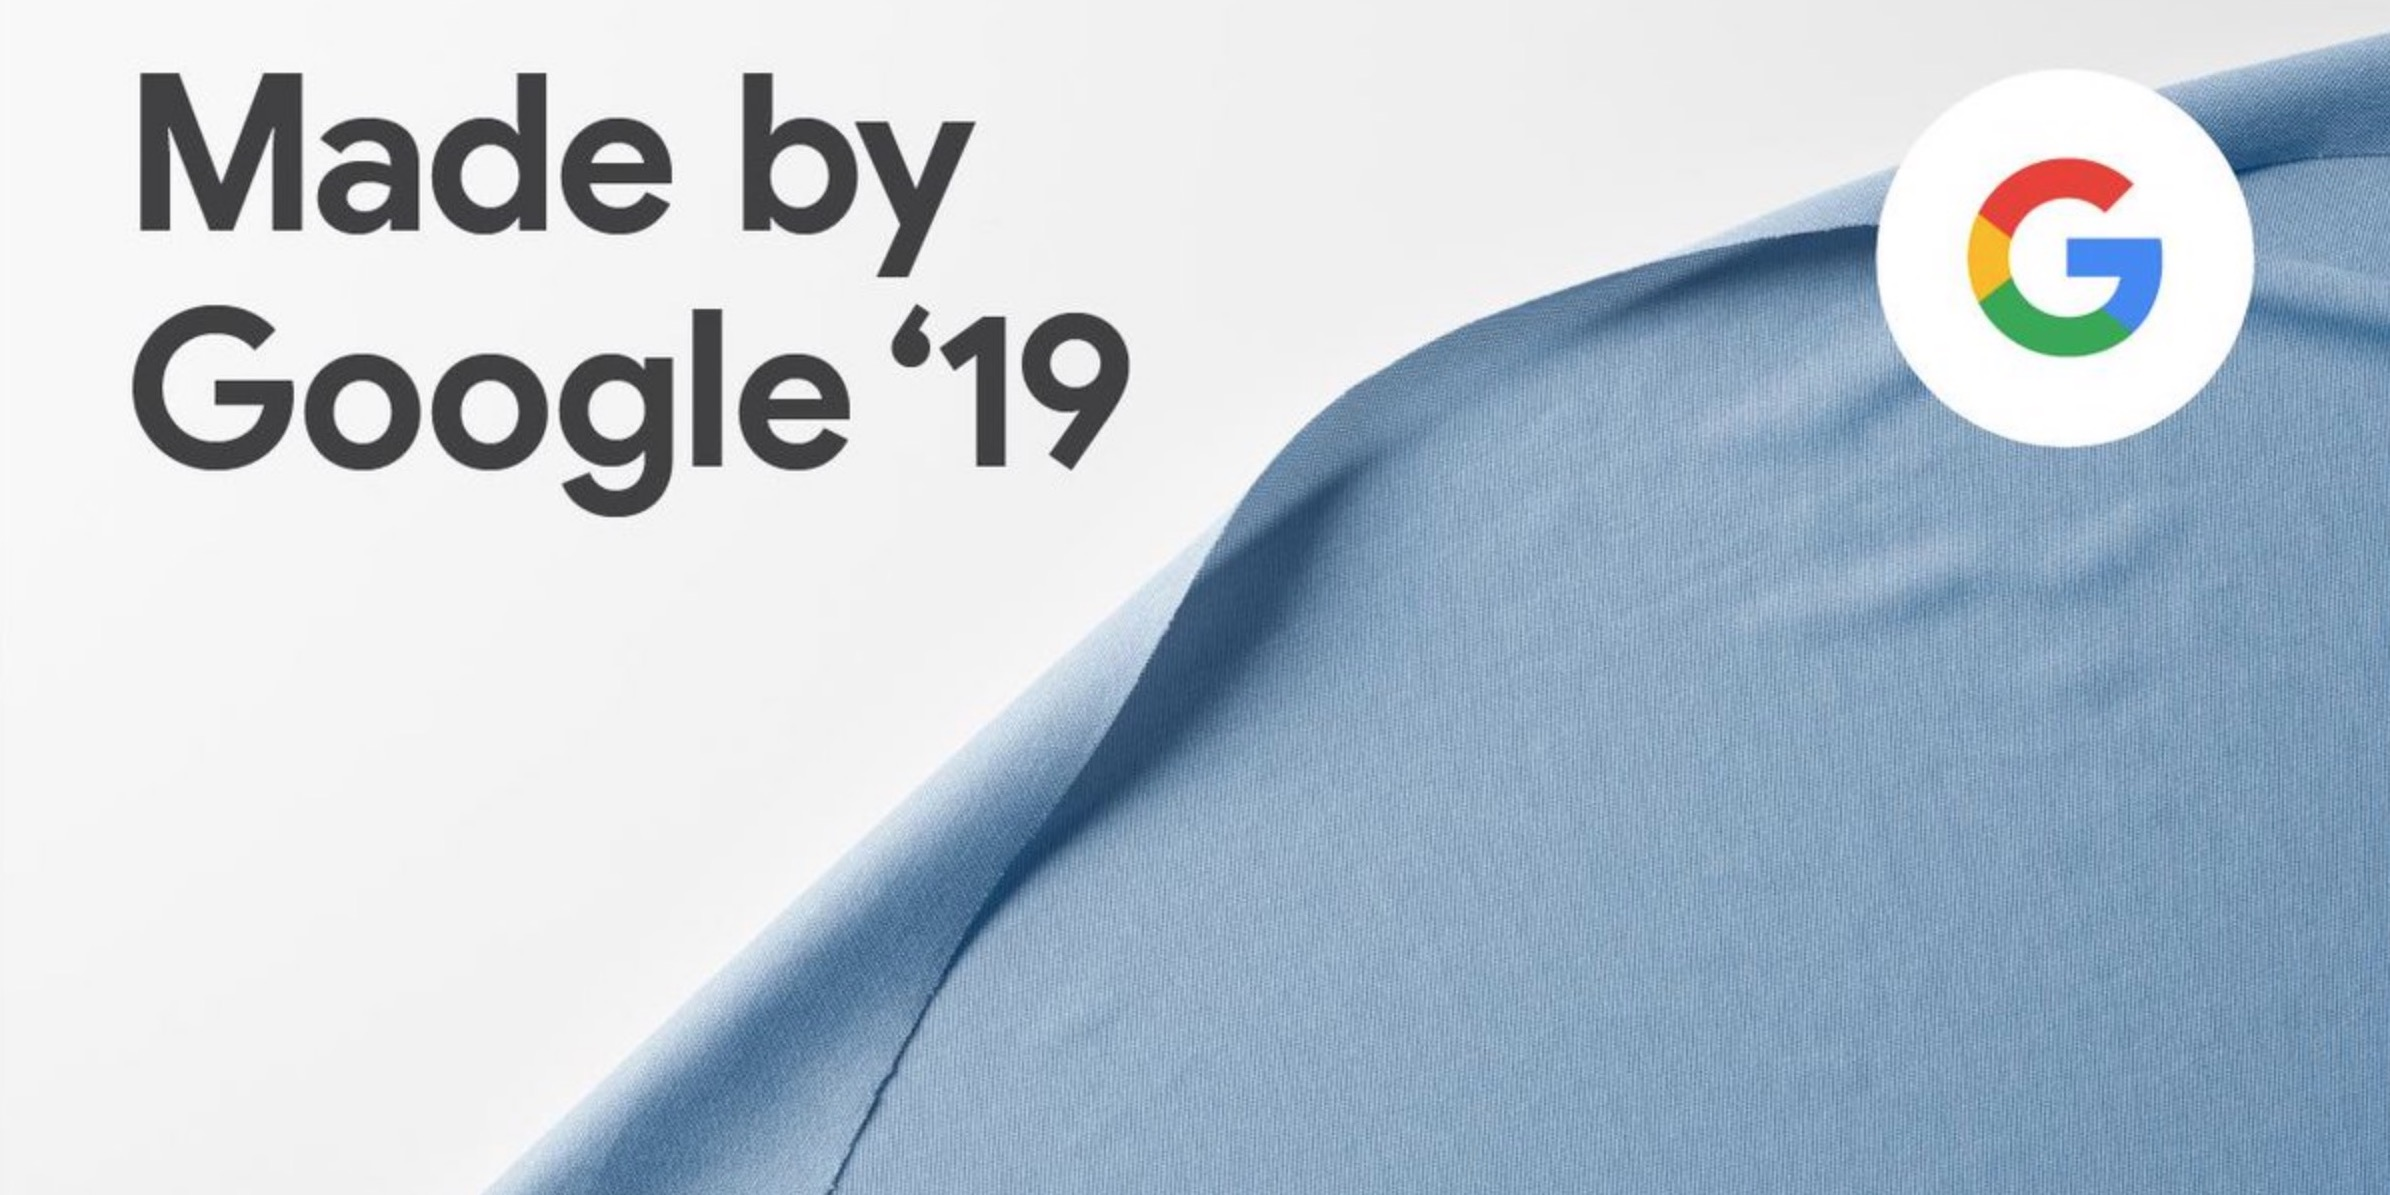 made-by-google-2019-livestream.jpg